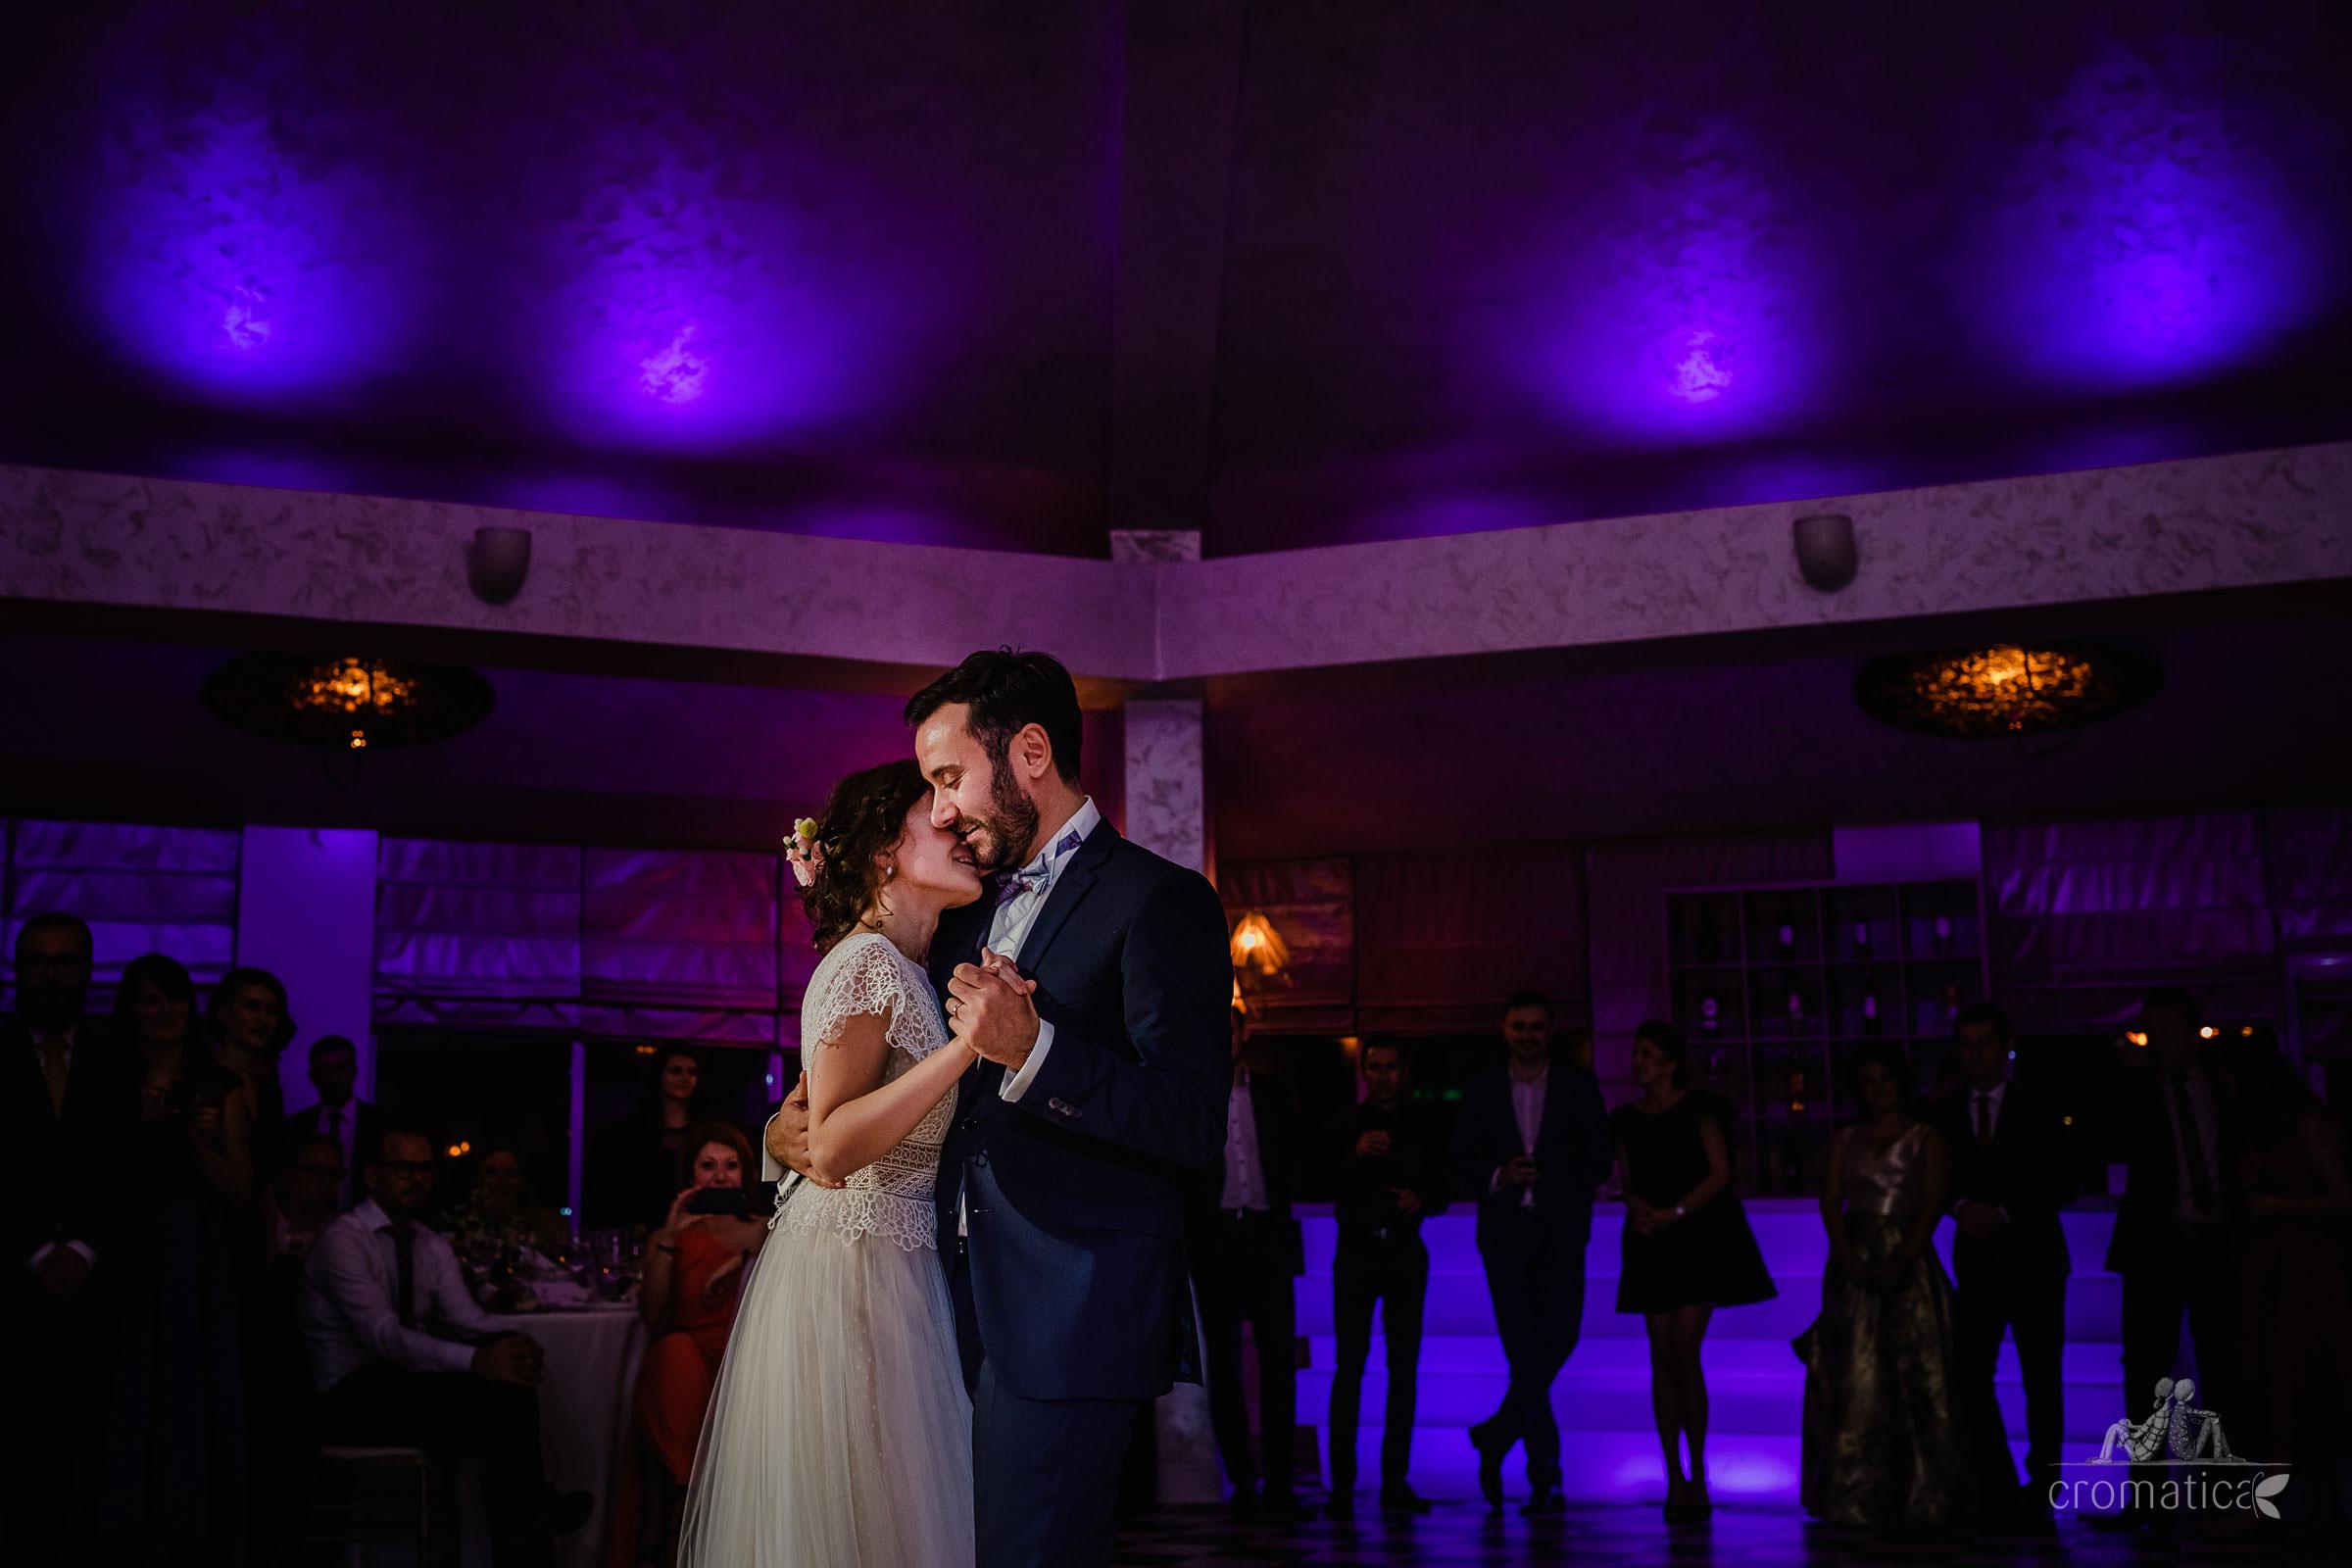 roxana mihai fotografii nunta la seratta 060